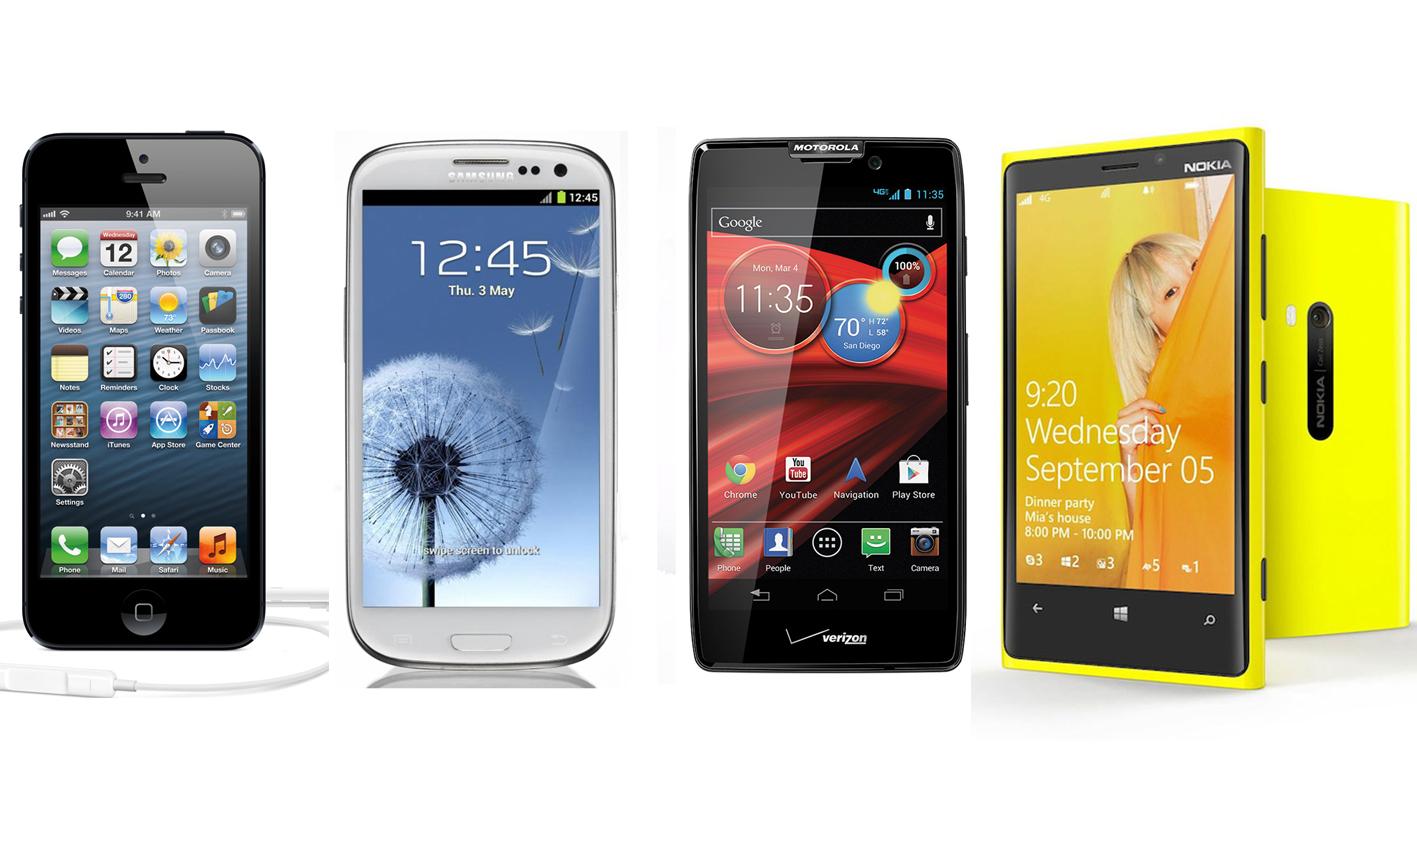 http://3.bp.blogspot.com/-92TubXi9HMM/UFaJIfaa0zI/AAAAAAAAAVs/smvMDYDu6yA/s1600/iphone-5-vs-galaxy-s3-vs-droid%20razr-hd-vs-lumia-920.jpg